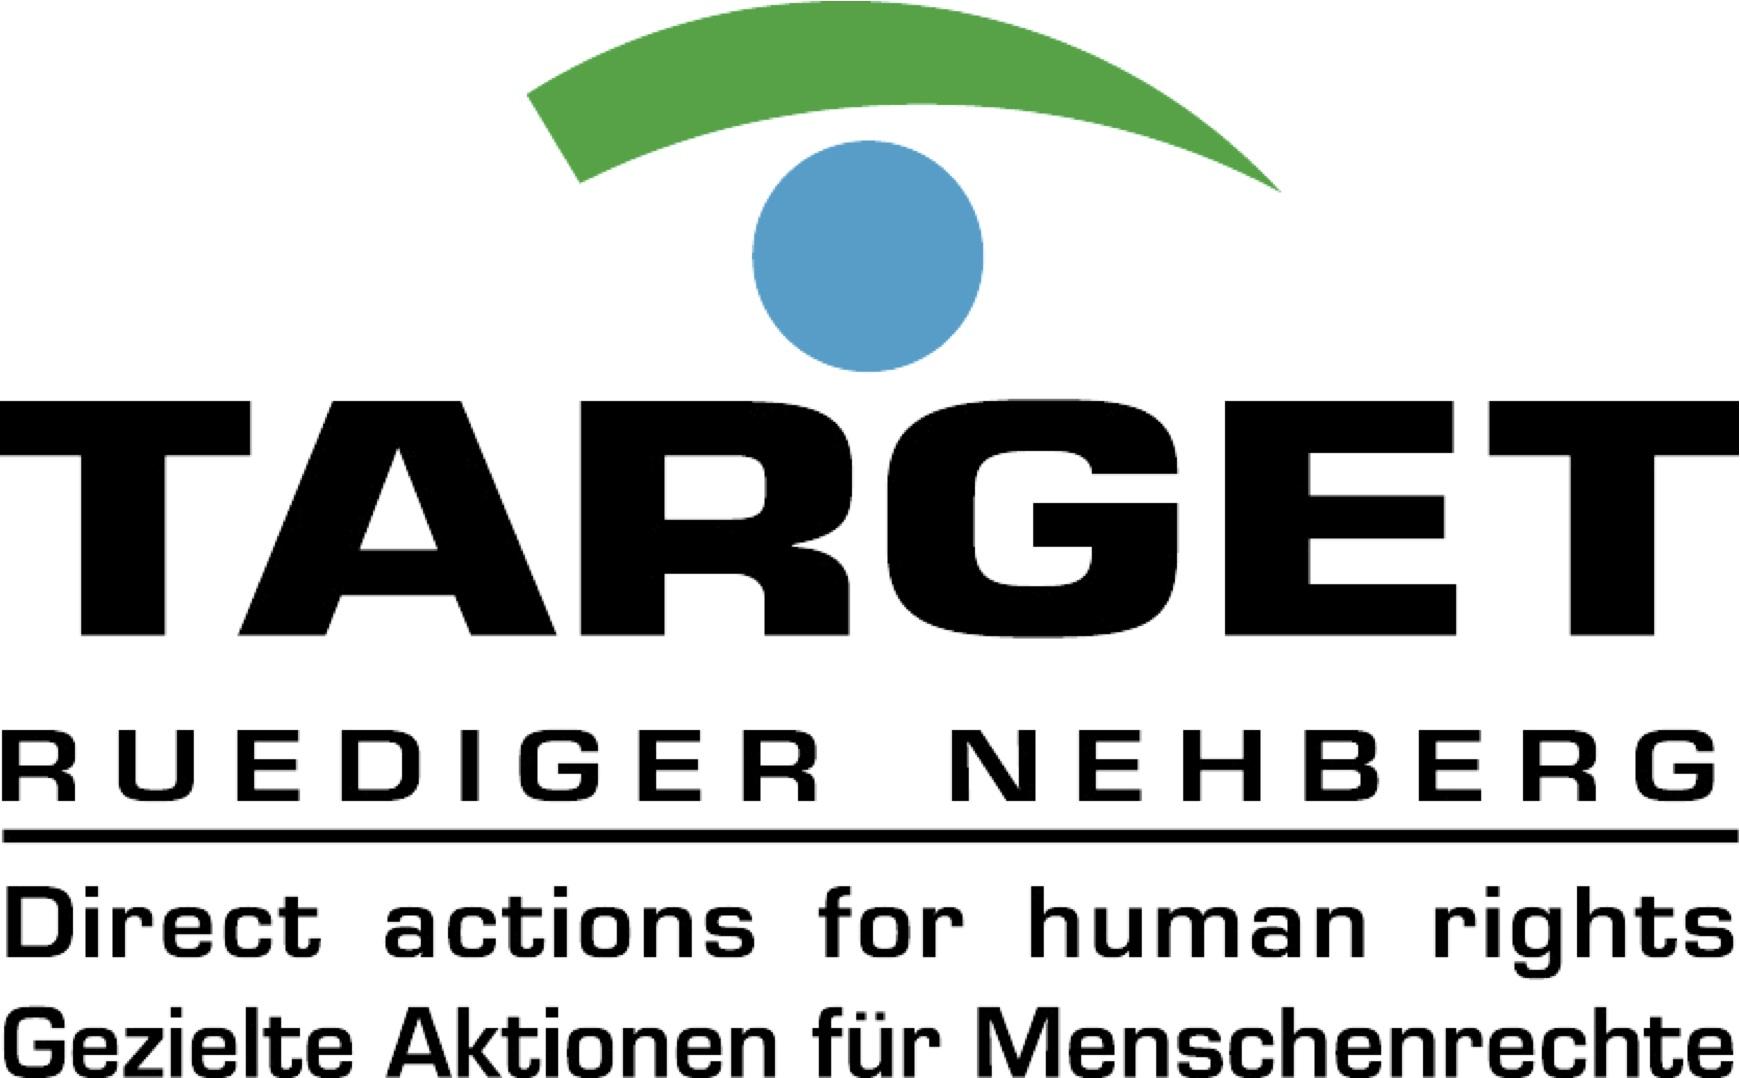 56543-logo-target-ruediger-nehberg